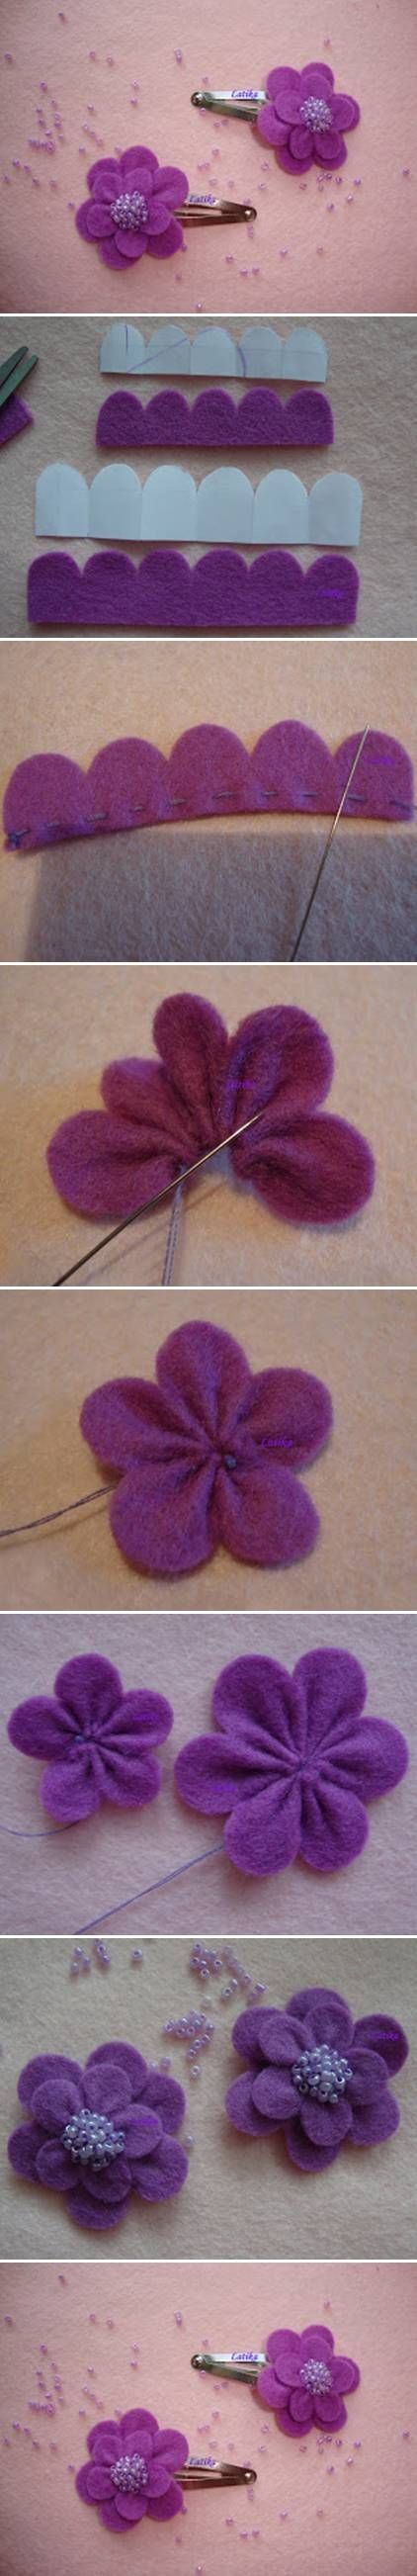 diy cute felt flowers purple clip tutorial with beads - headwear, felt flowers crafts